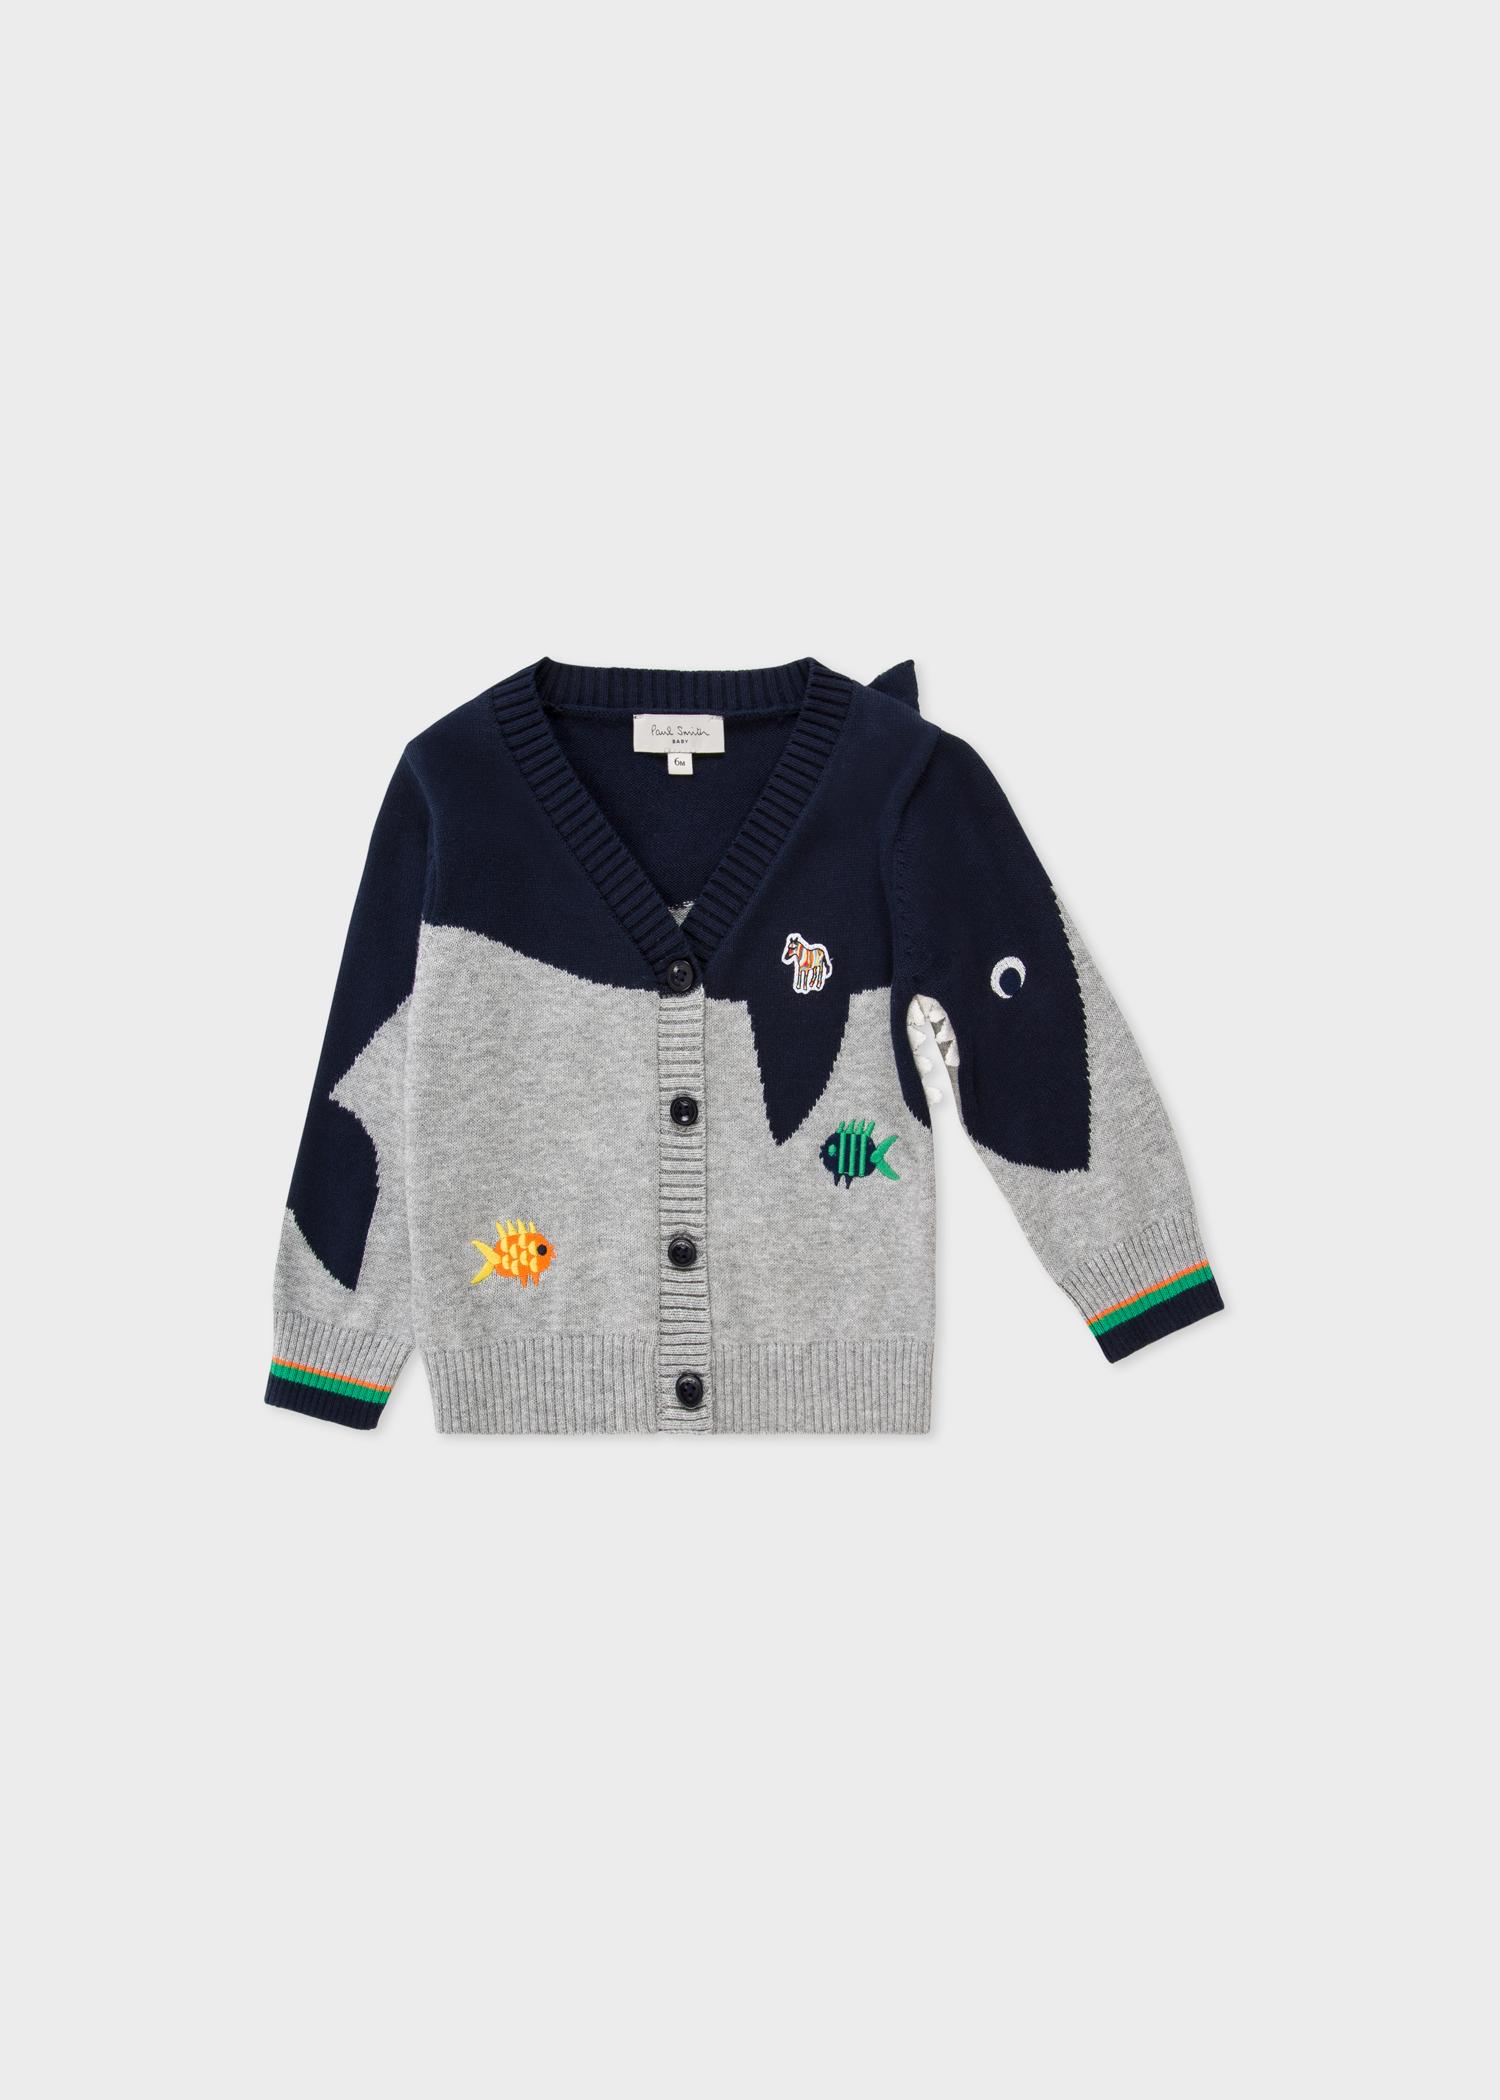 0316e22f8 Baby Boys  Grey  Shark  Jacquard Cotton Cardigan - Paul Smith Asia